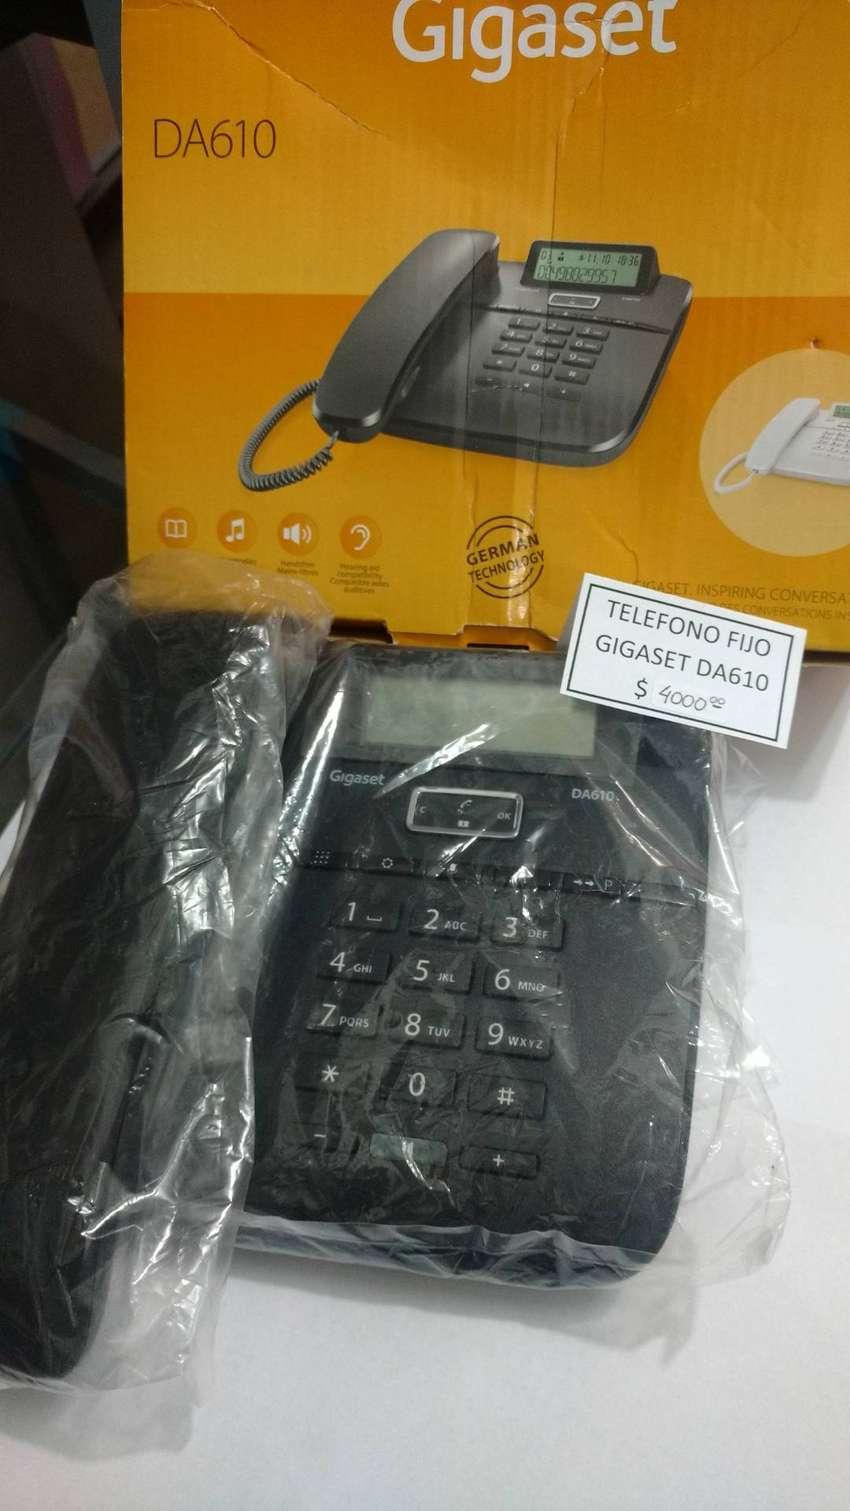 TELEFONO FIJO GIGASET DA610 - NUEVO 0